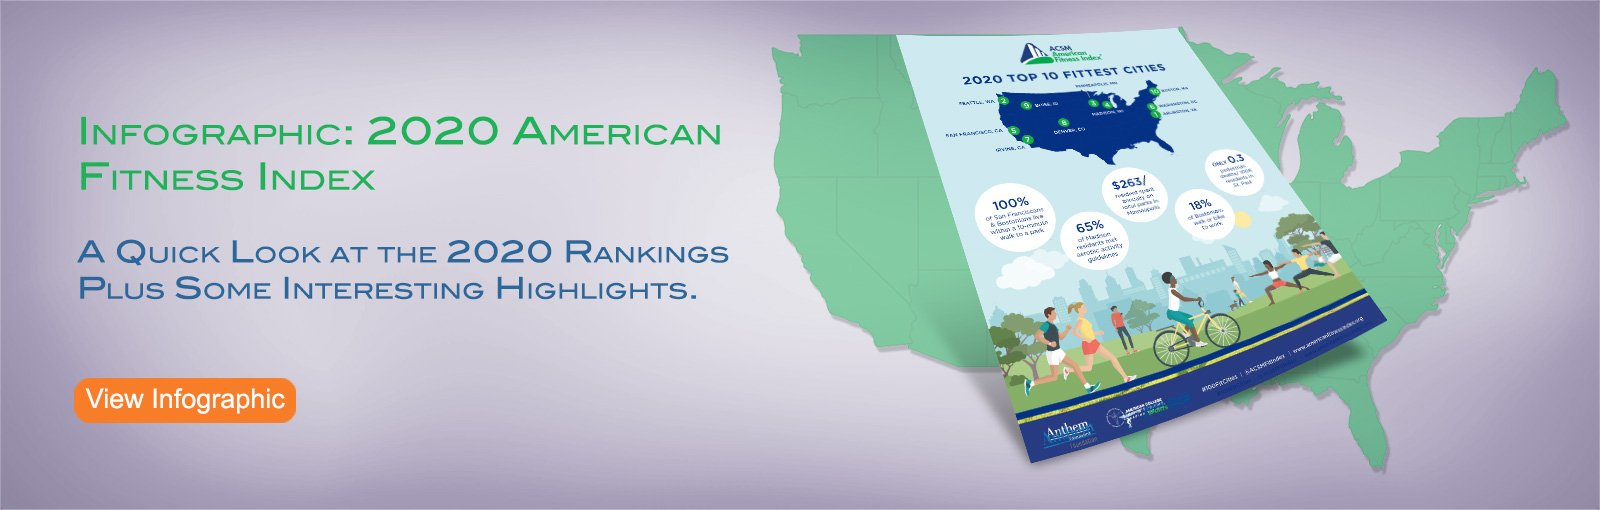 acsm-american-fitness-index-2020-infographic